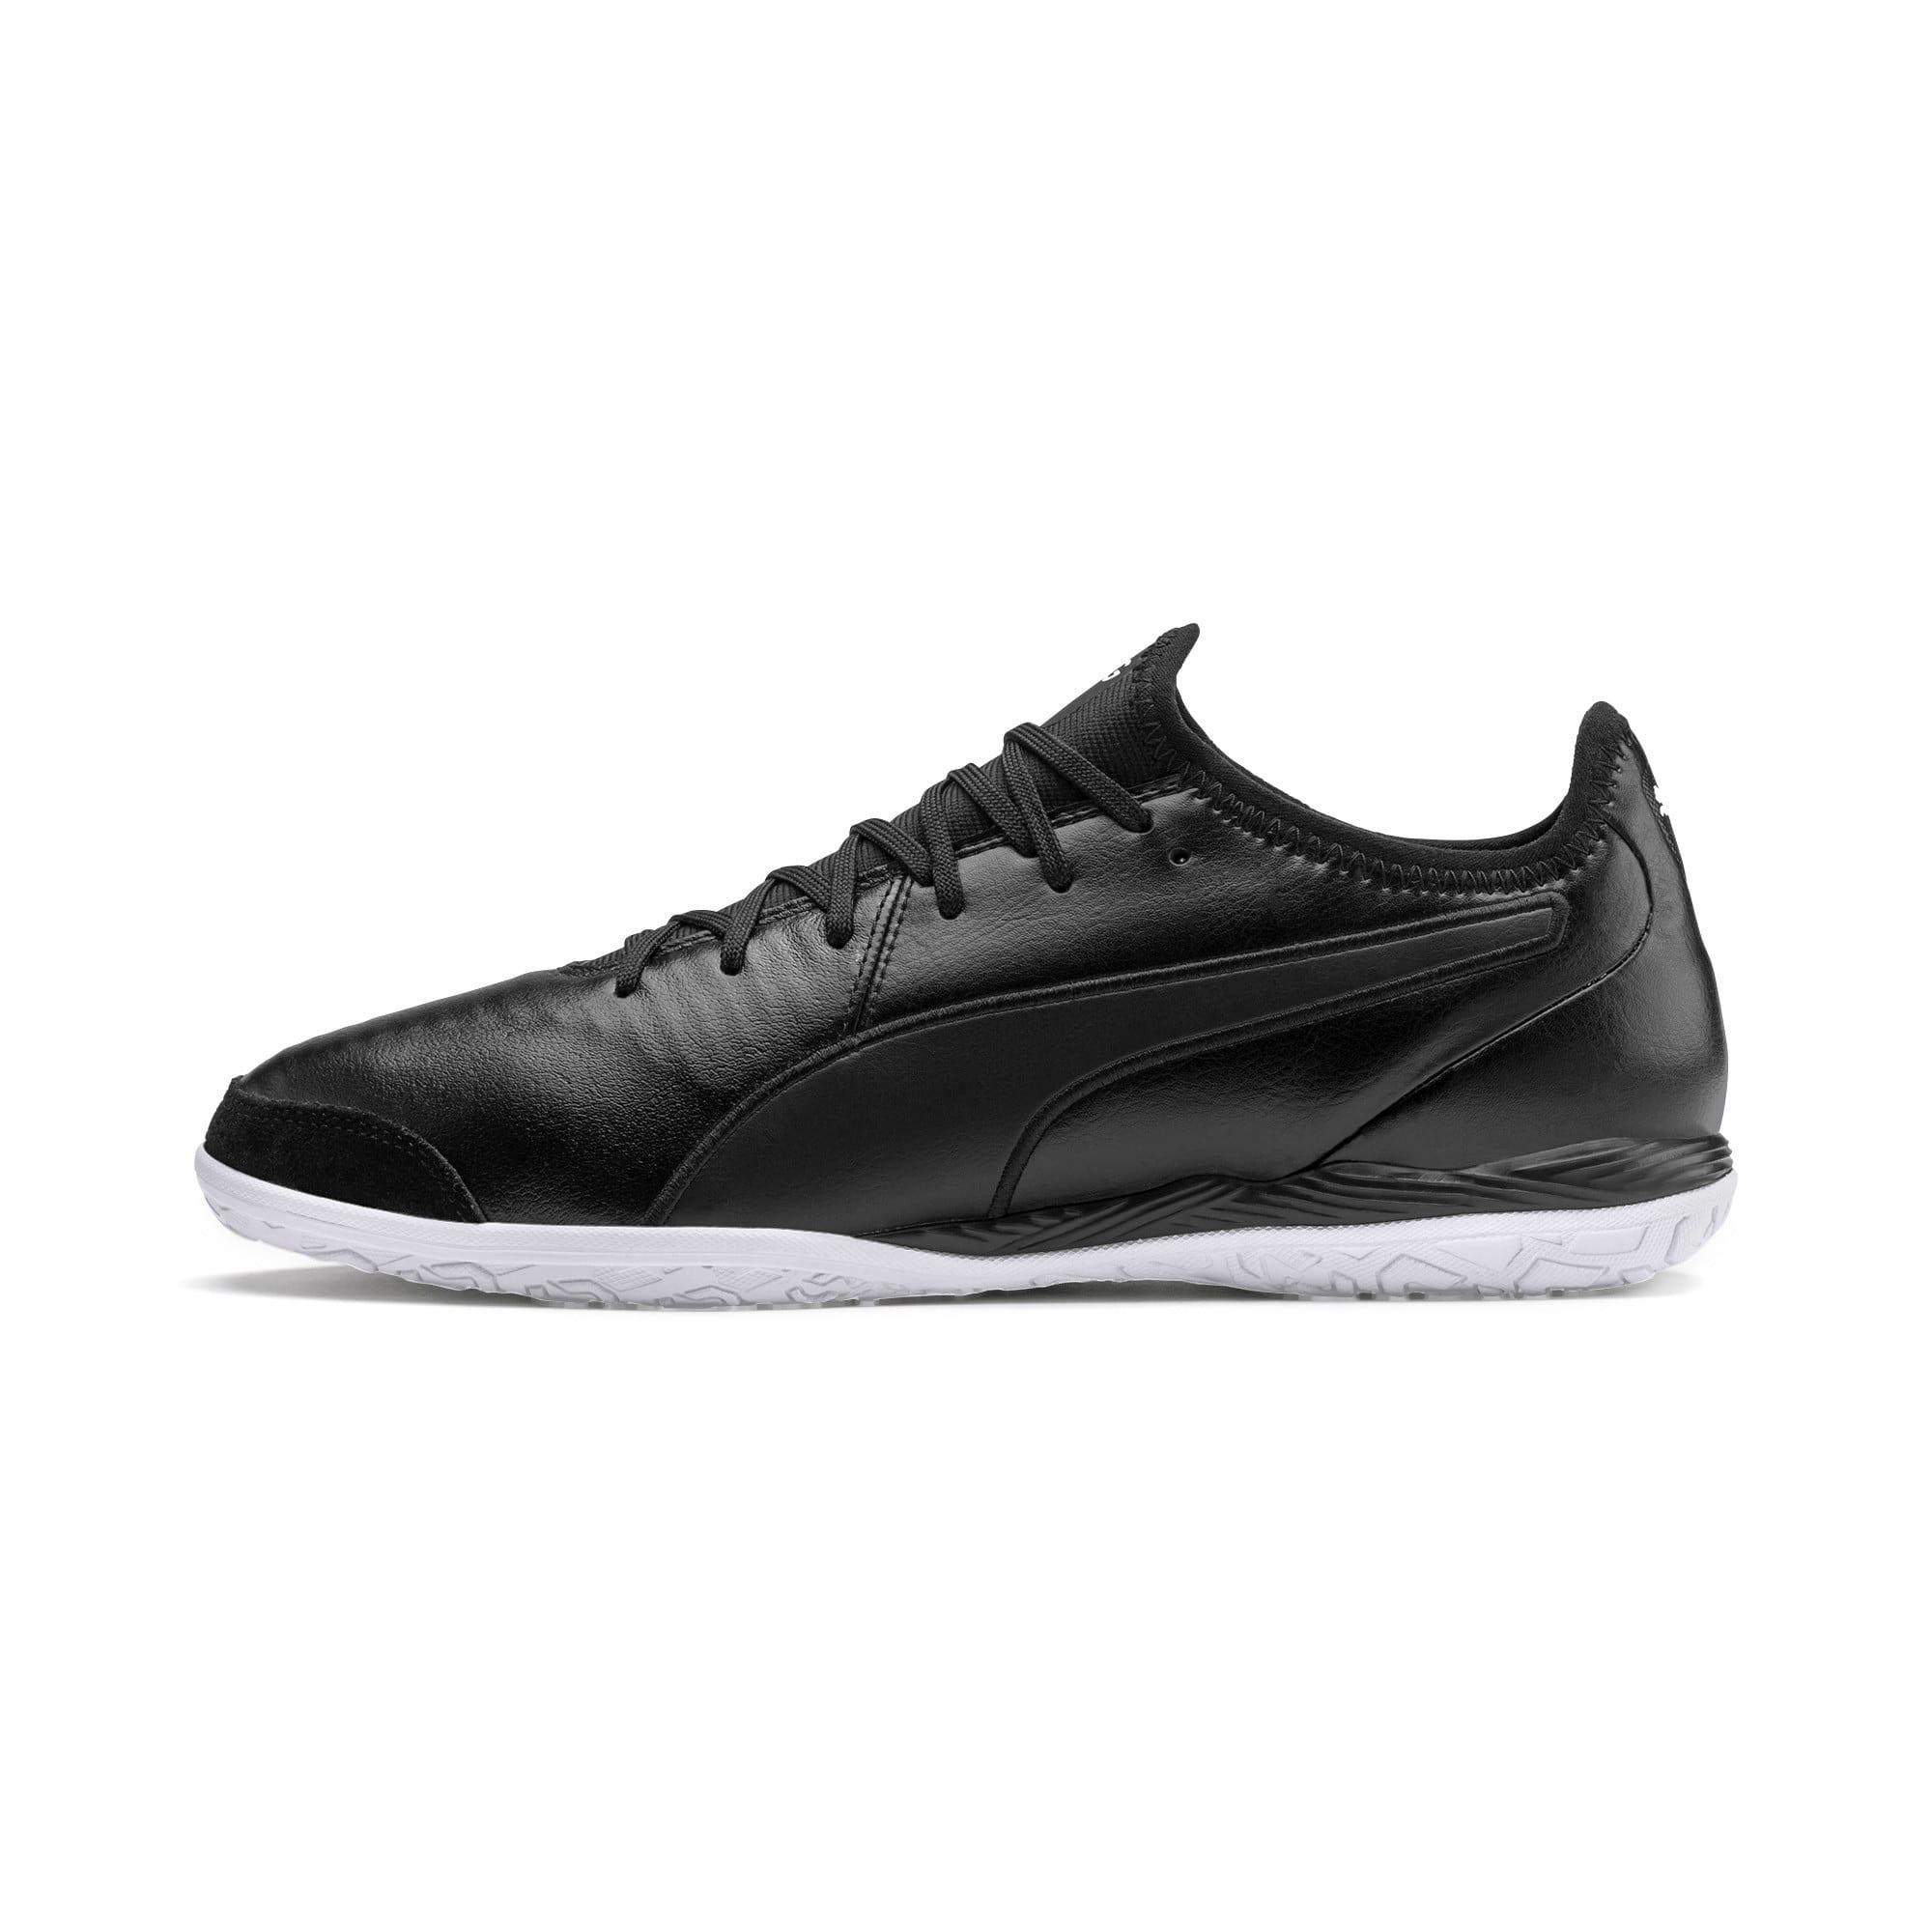 Thumbnail 1 of King Pro IT Soccer Shoes, Puma Black-Puma White, medium